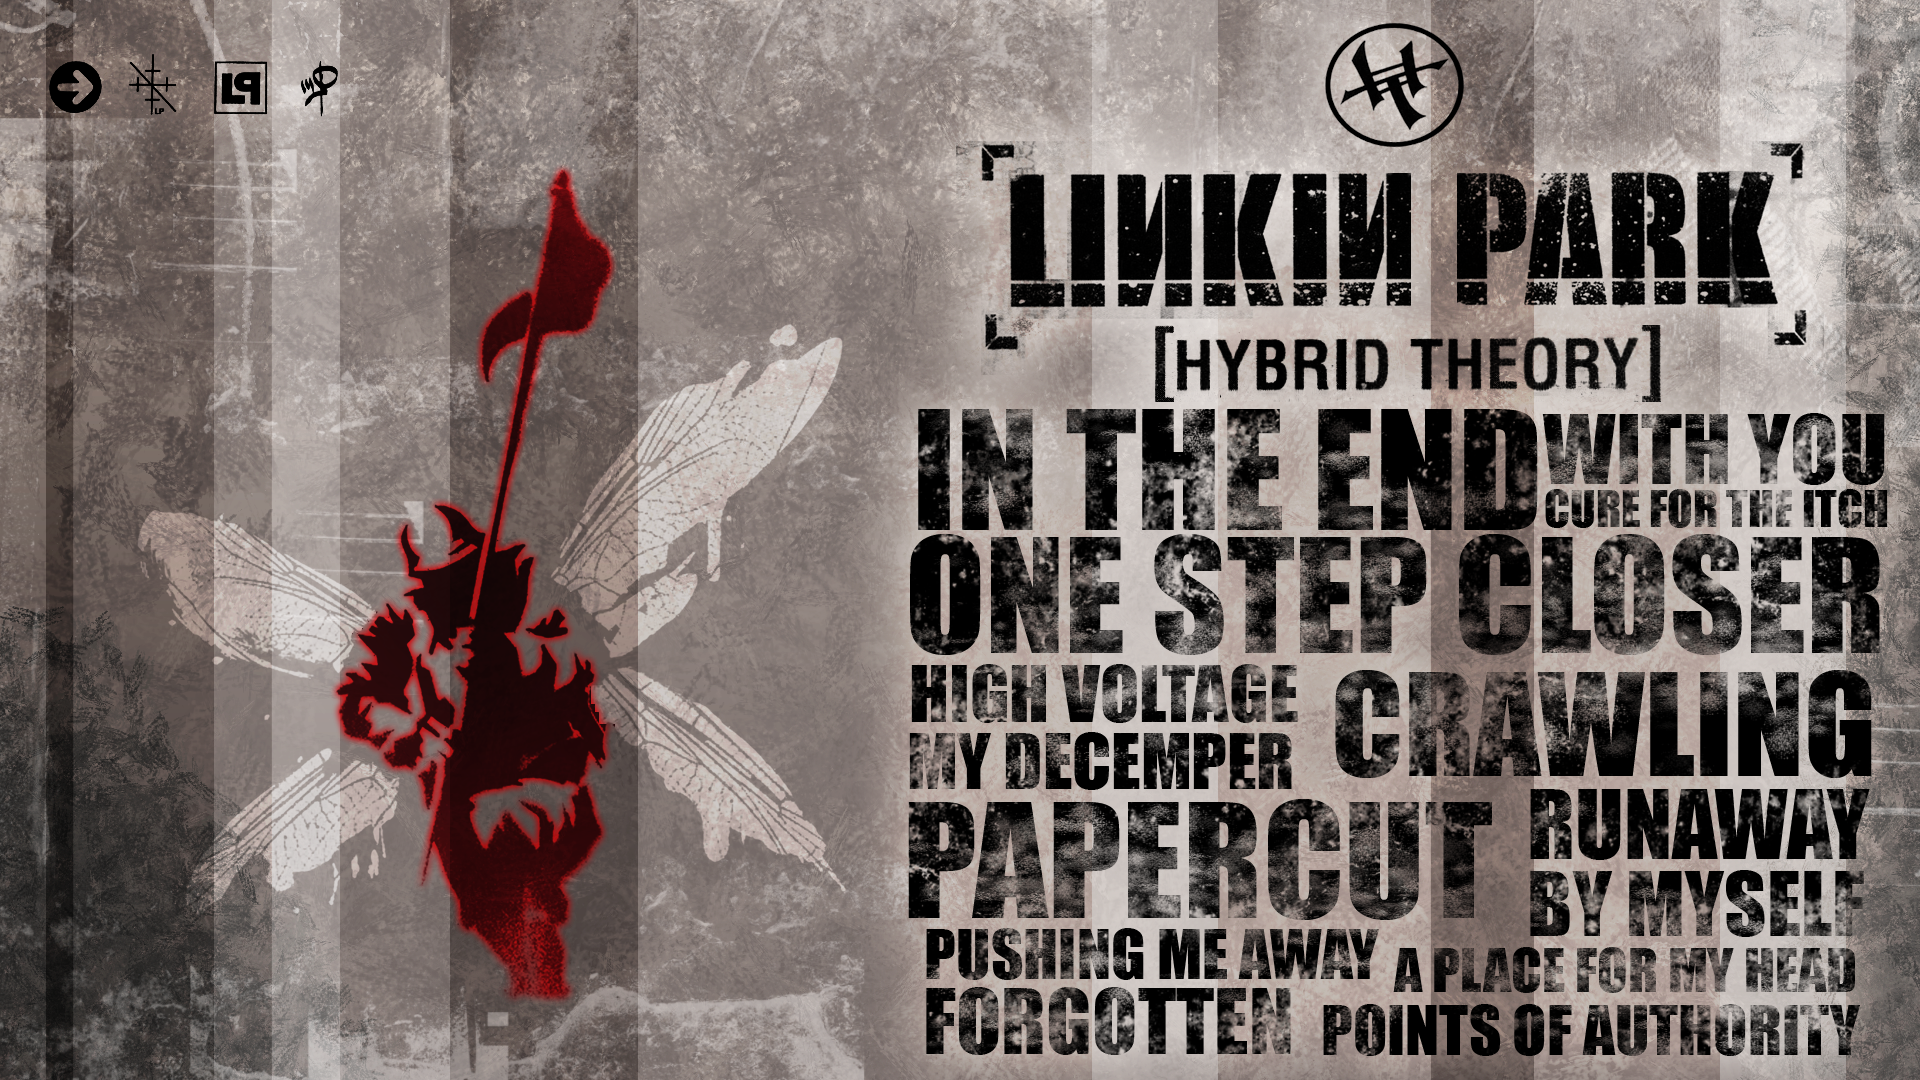 Linkin Park Hybrid Theory Wallpapers Desktop Background Bozhuwallpaper Linkin Park Wallpaper Linkin Park Hybrid Theory Linkin Park